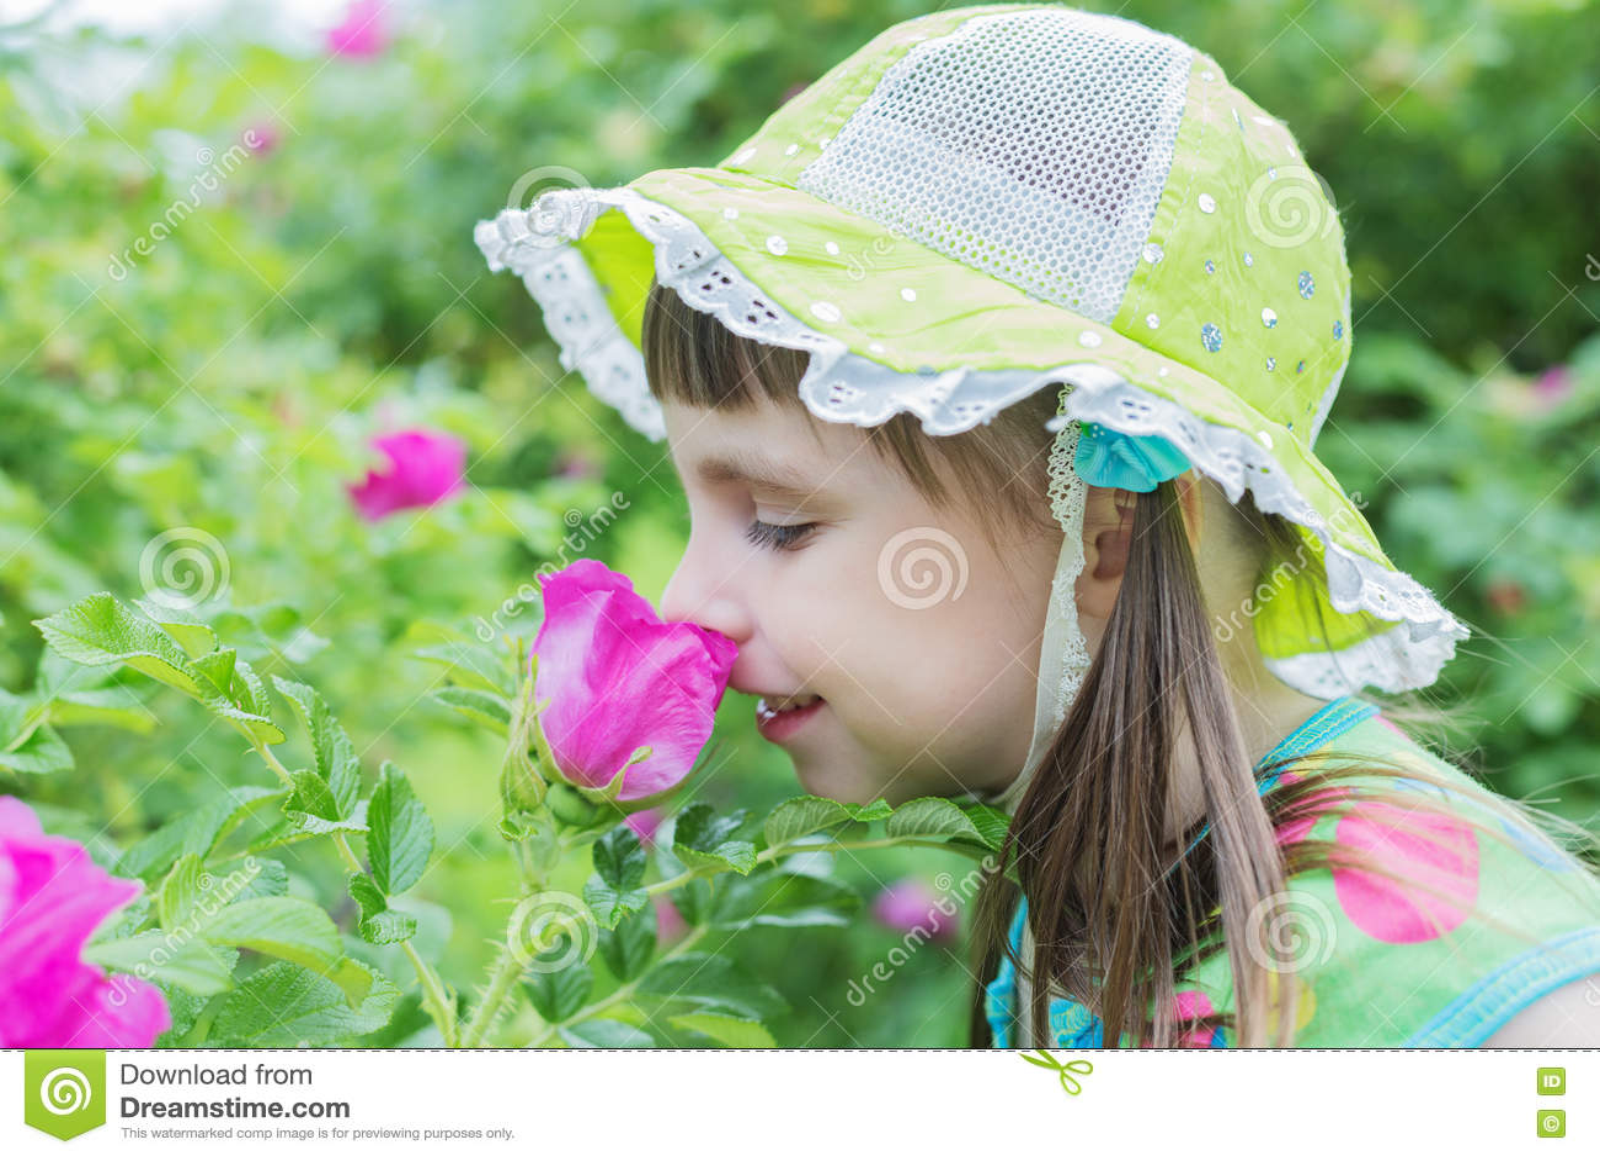 La niña linda inhala el aroma de la flor